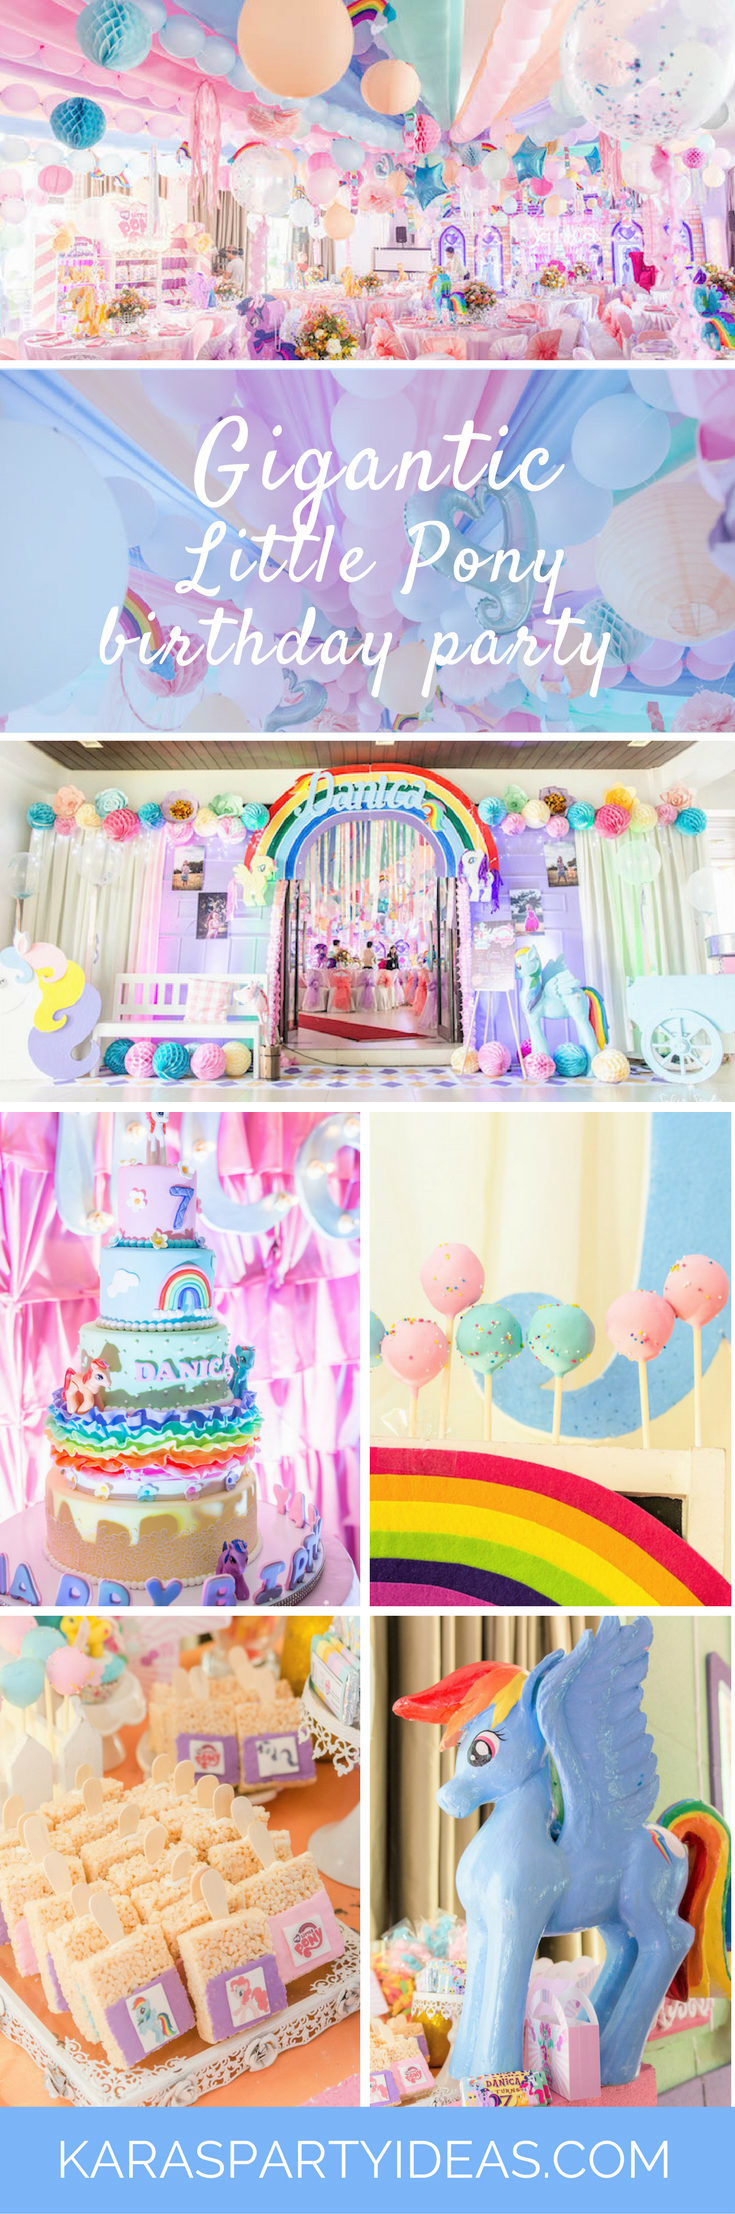 Terrific Karas Party Ideas Gigantic Little Pony Birthday Karas Party Ideas Personalised Birthday Cards Veneteletsinfo